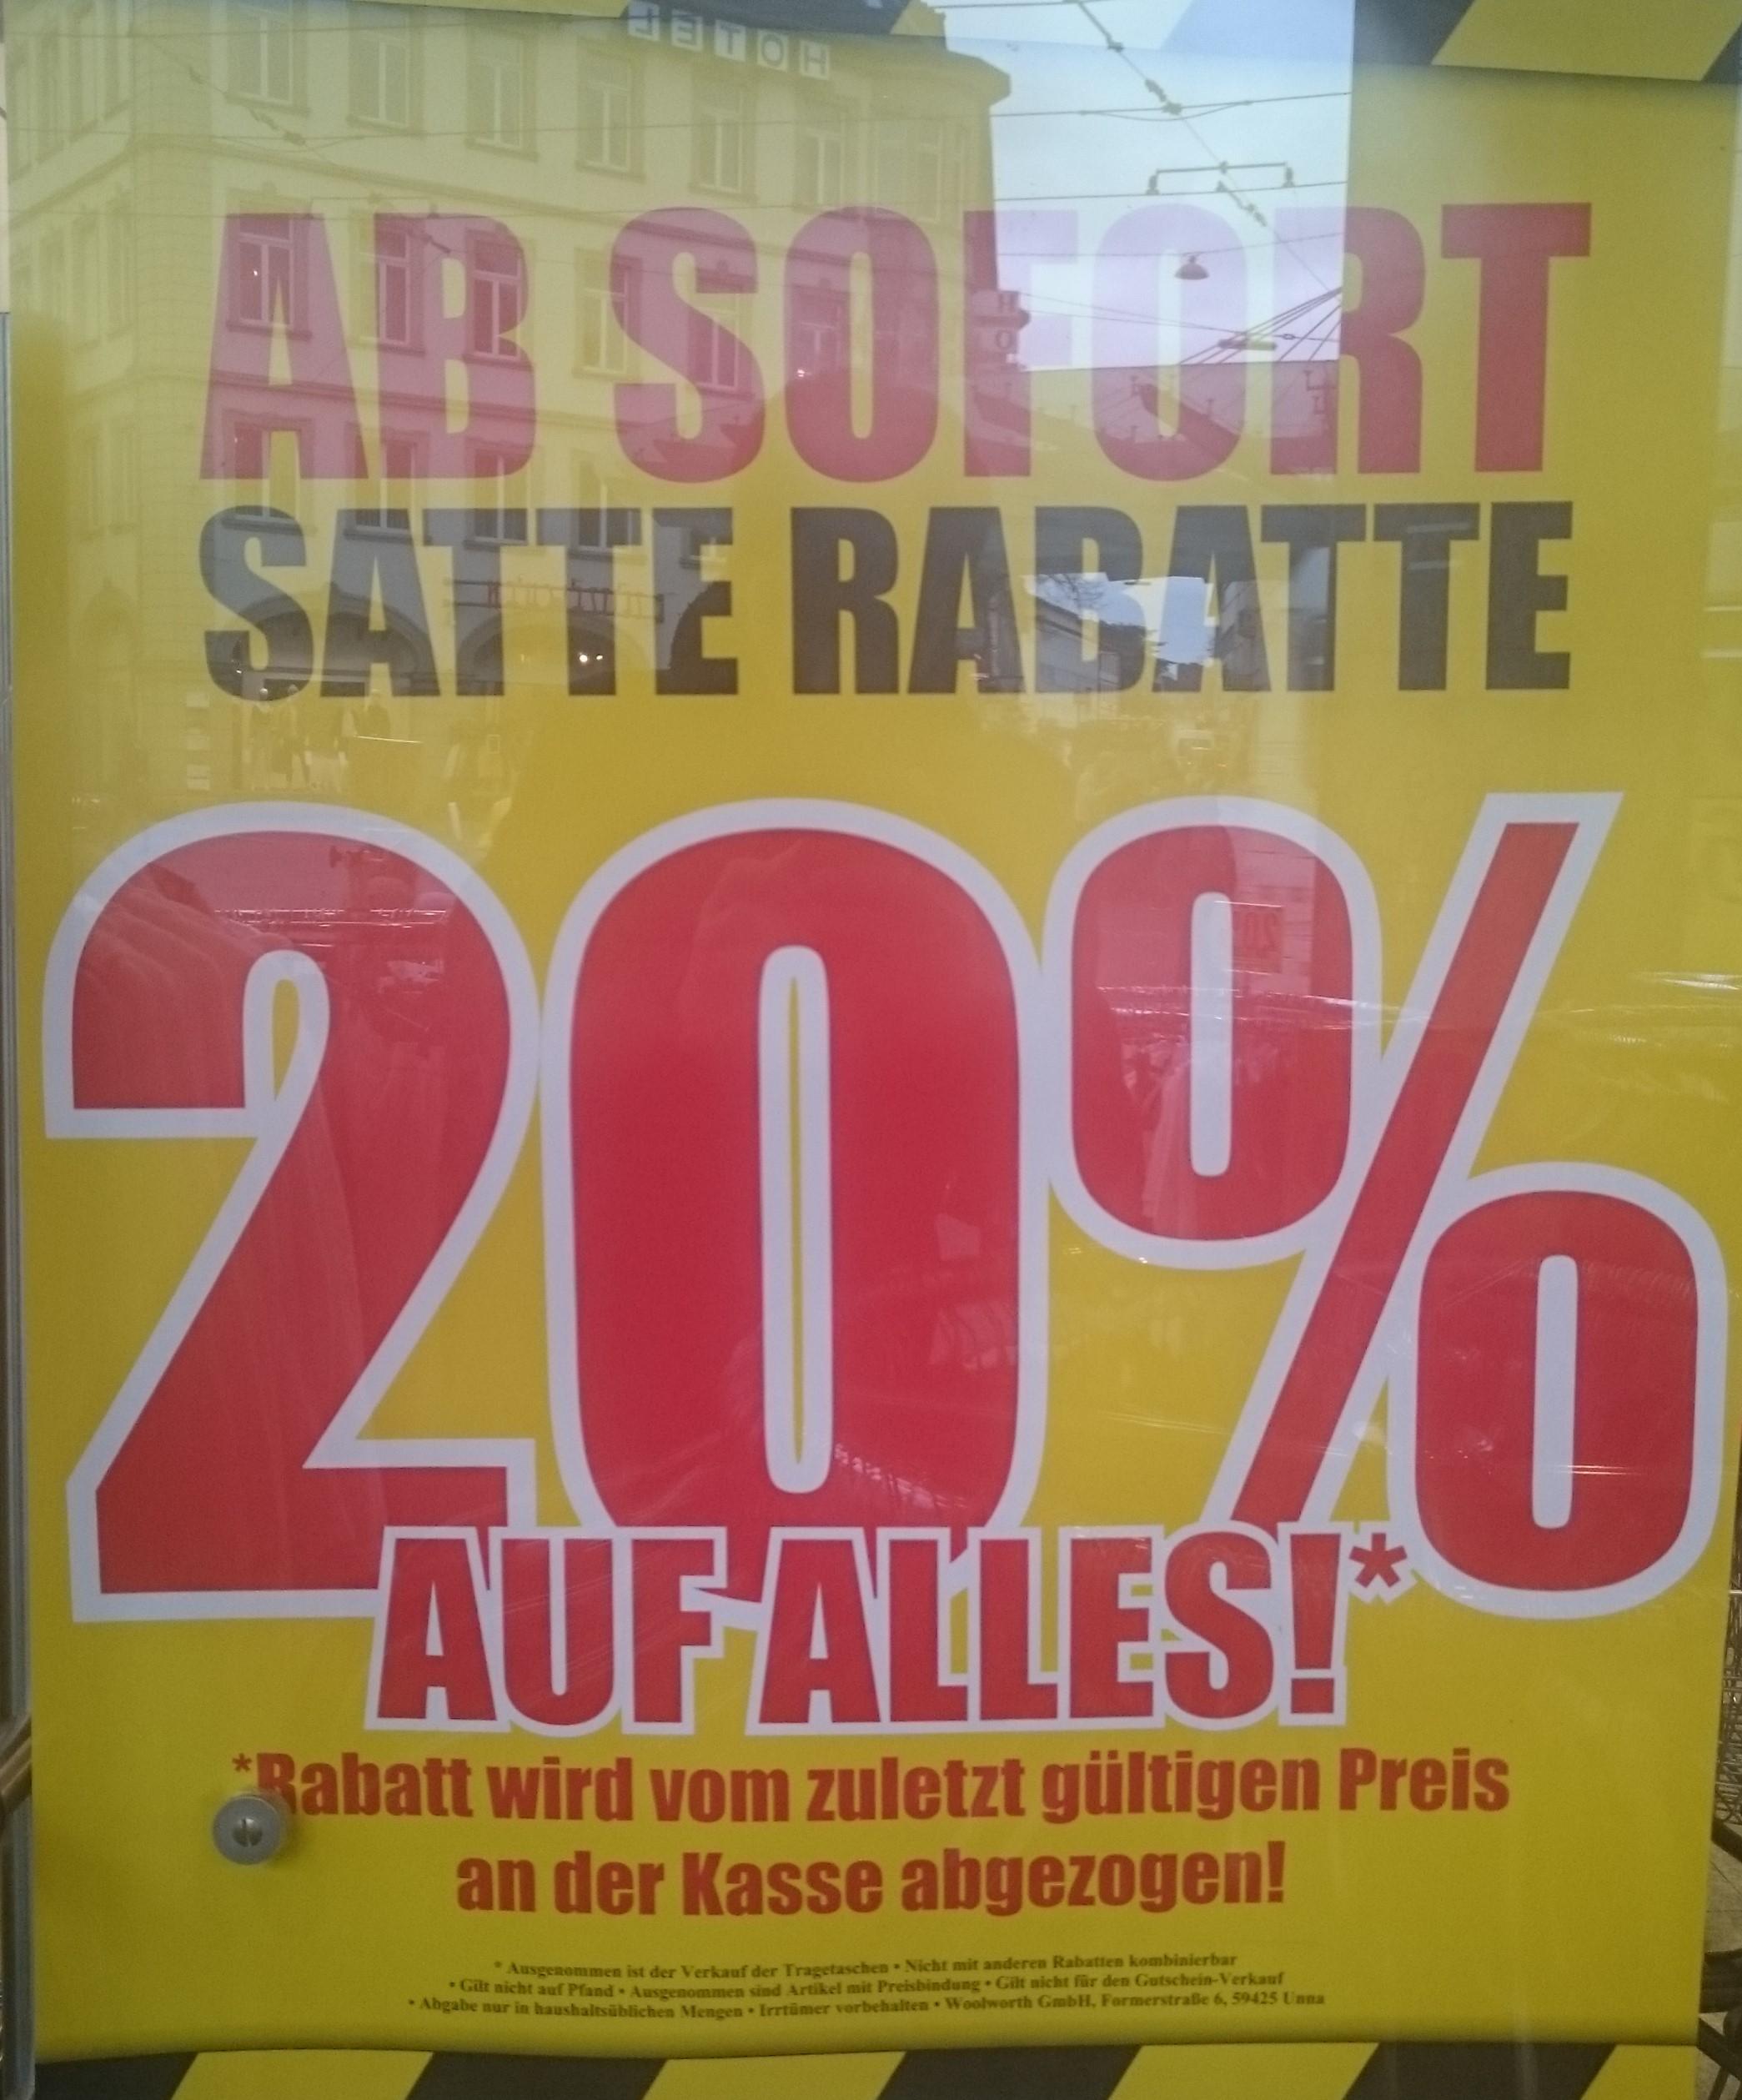 [Lokal Würzburg] 20% auf alles bei Woolworth